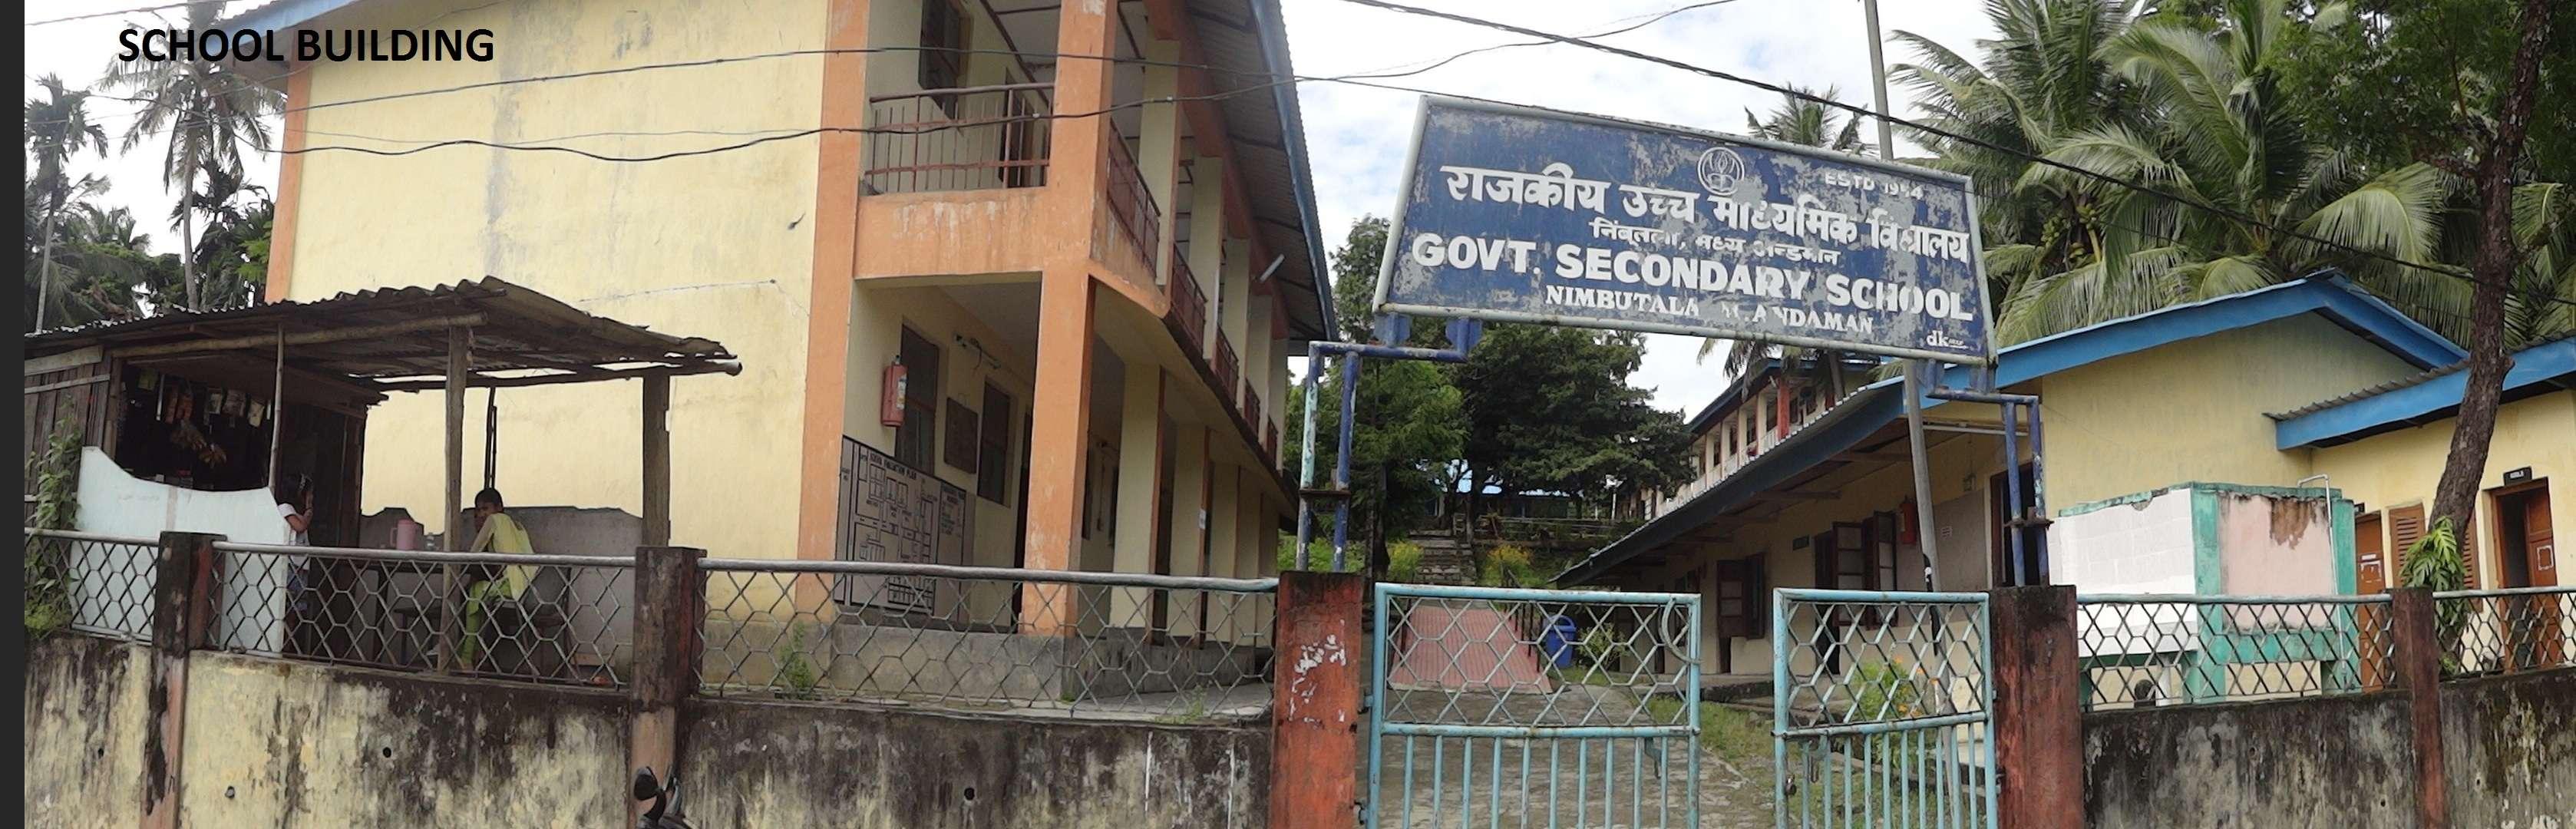 GOVT SECONDARY SCHOOL NIMBUTALA VILL amp PO MIDDLE ANDAMAN A amp N ISLANDS 2520055